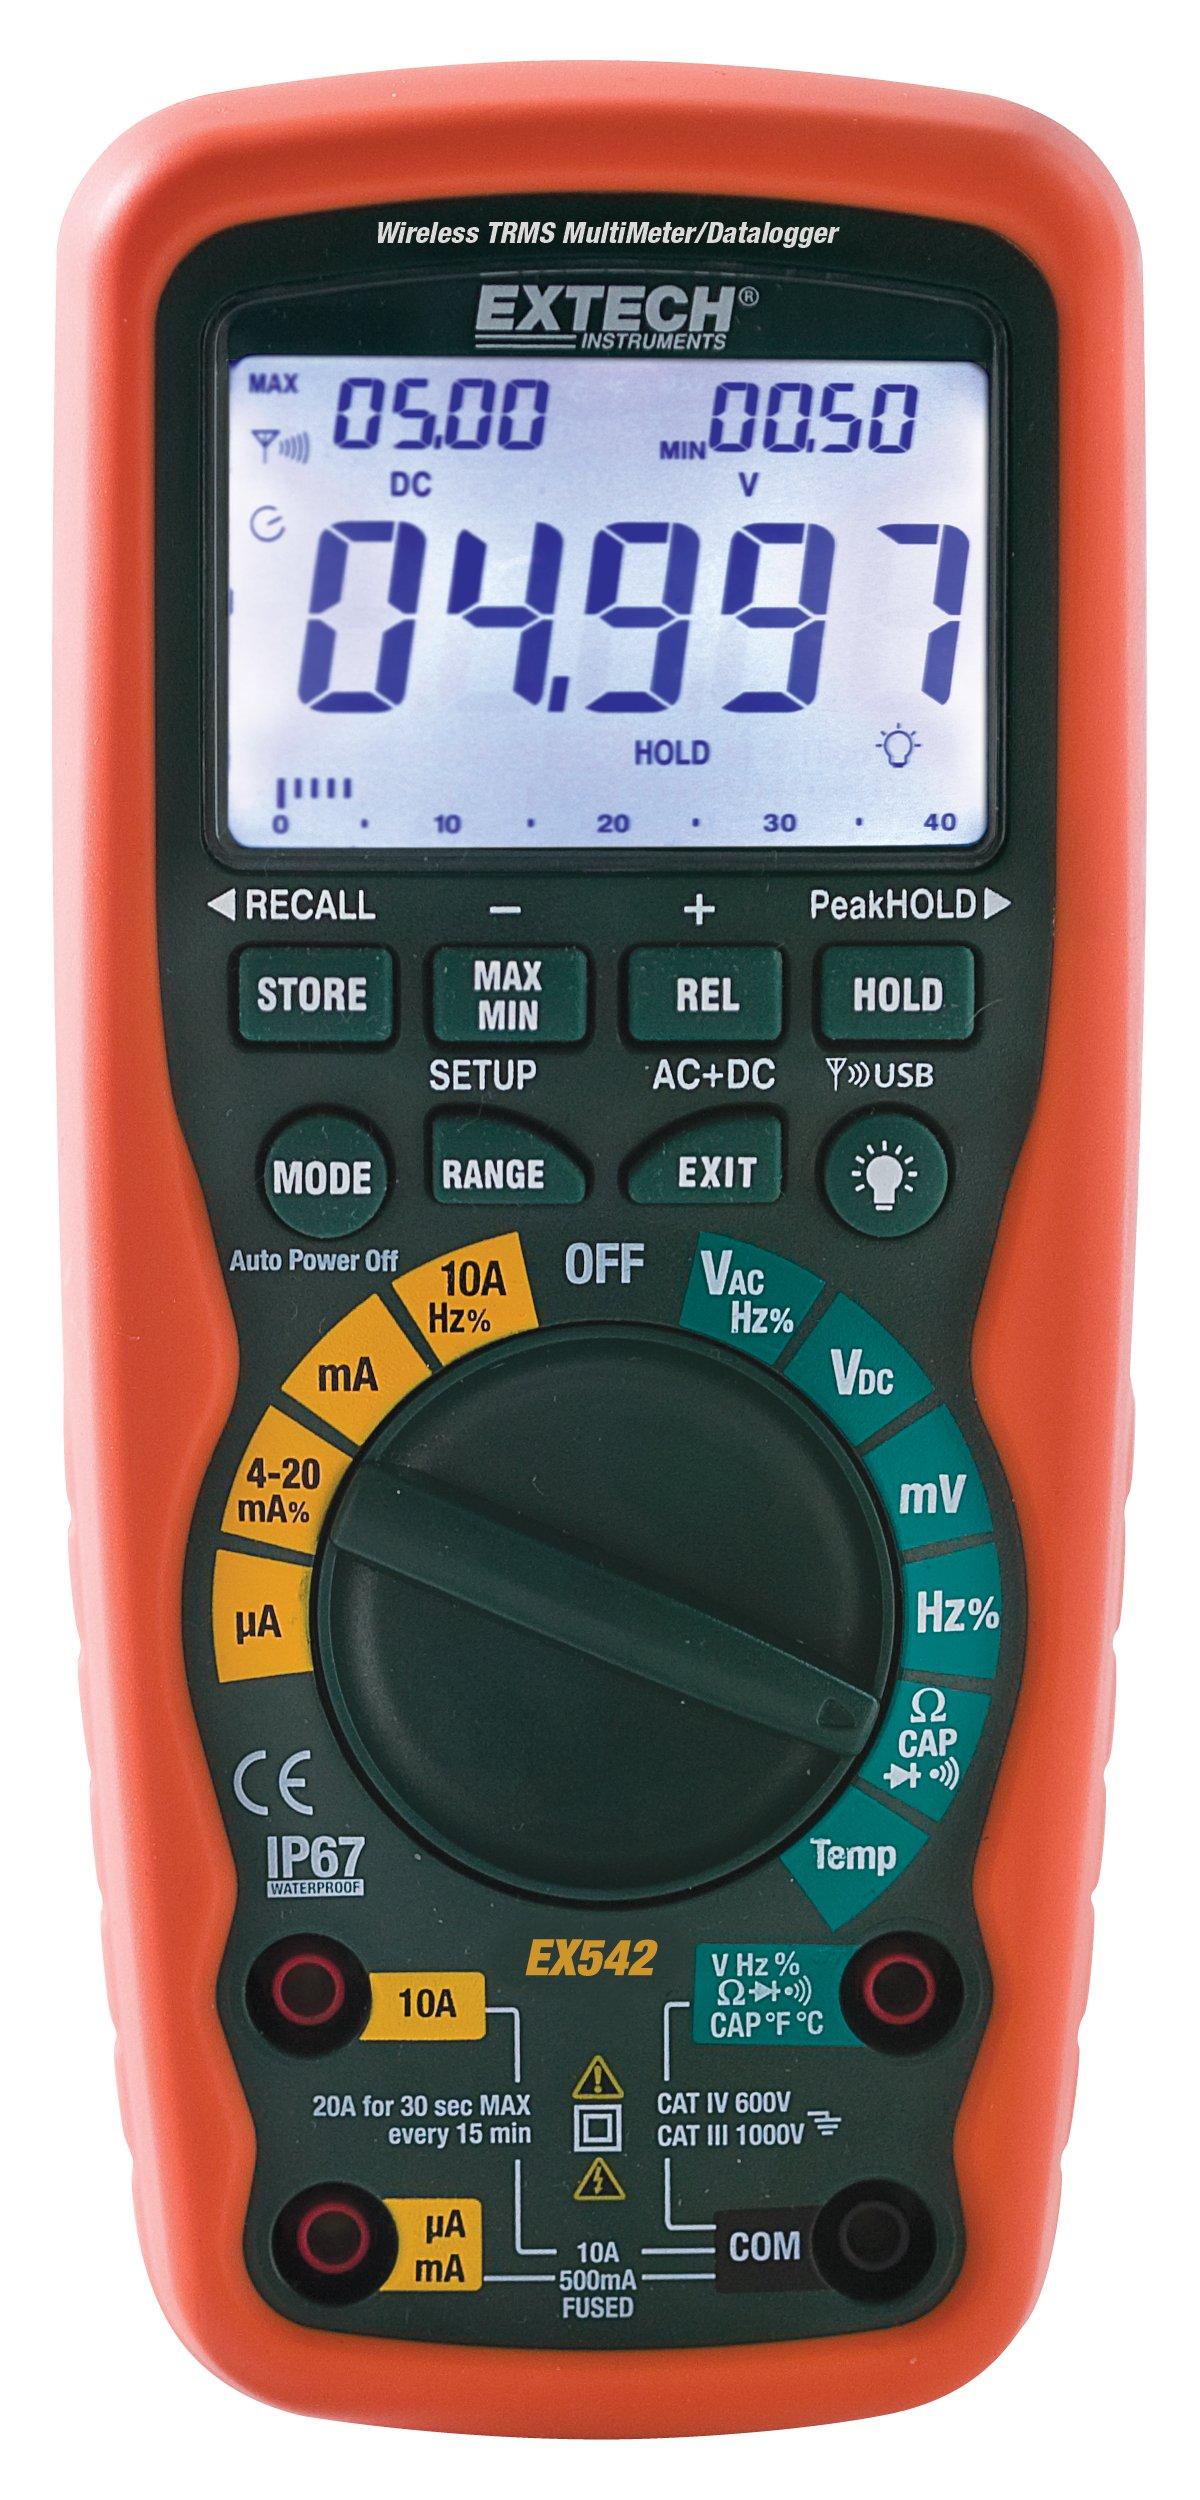 Extech EX542 Wireless 433MHz True RMS Industrial MultiMeter/Datalogger